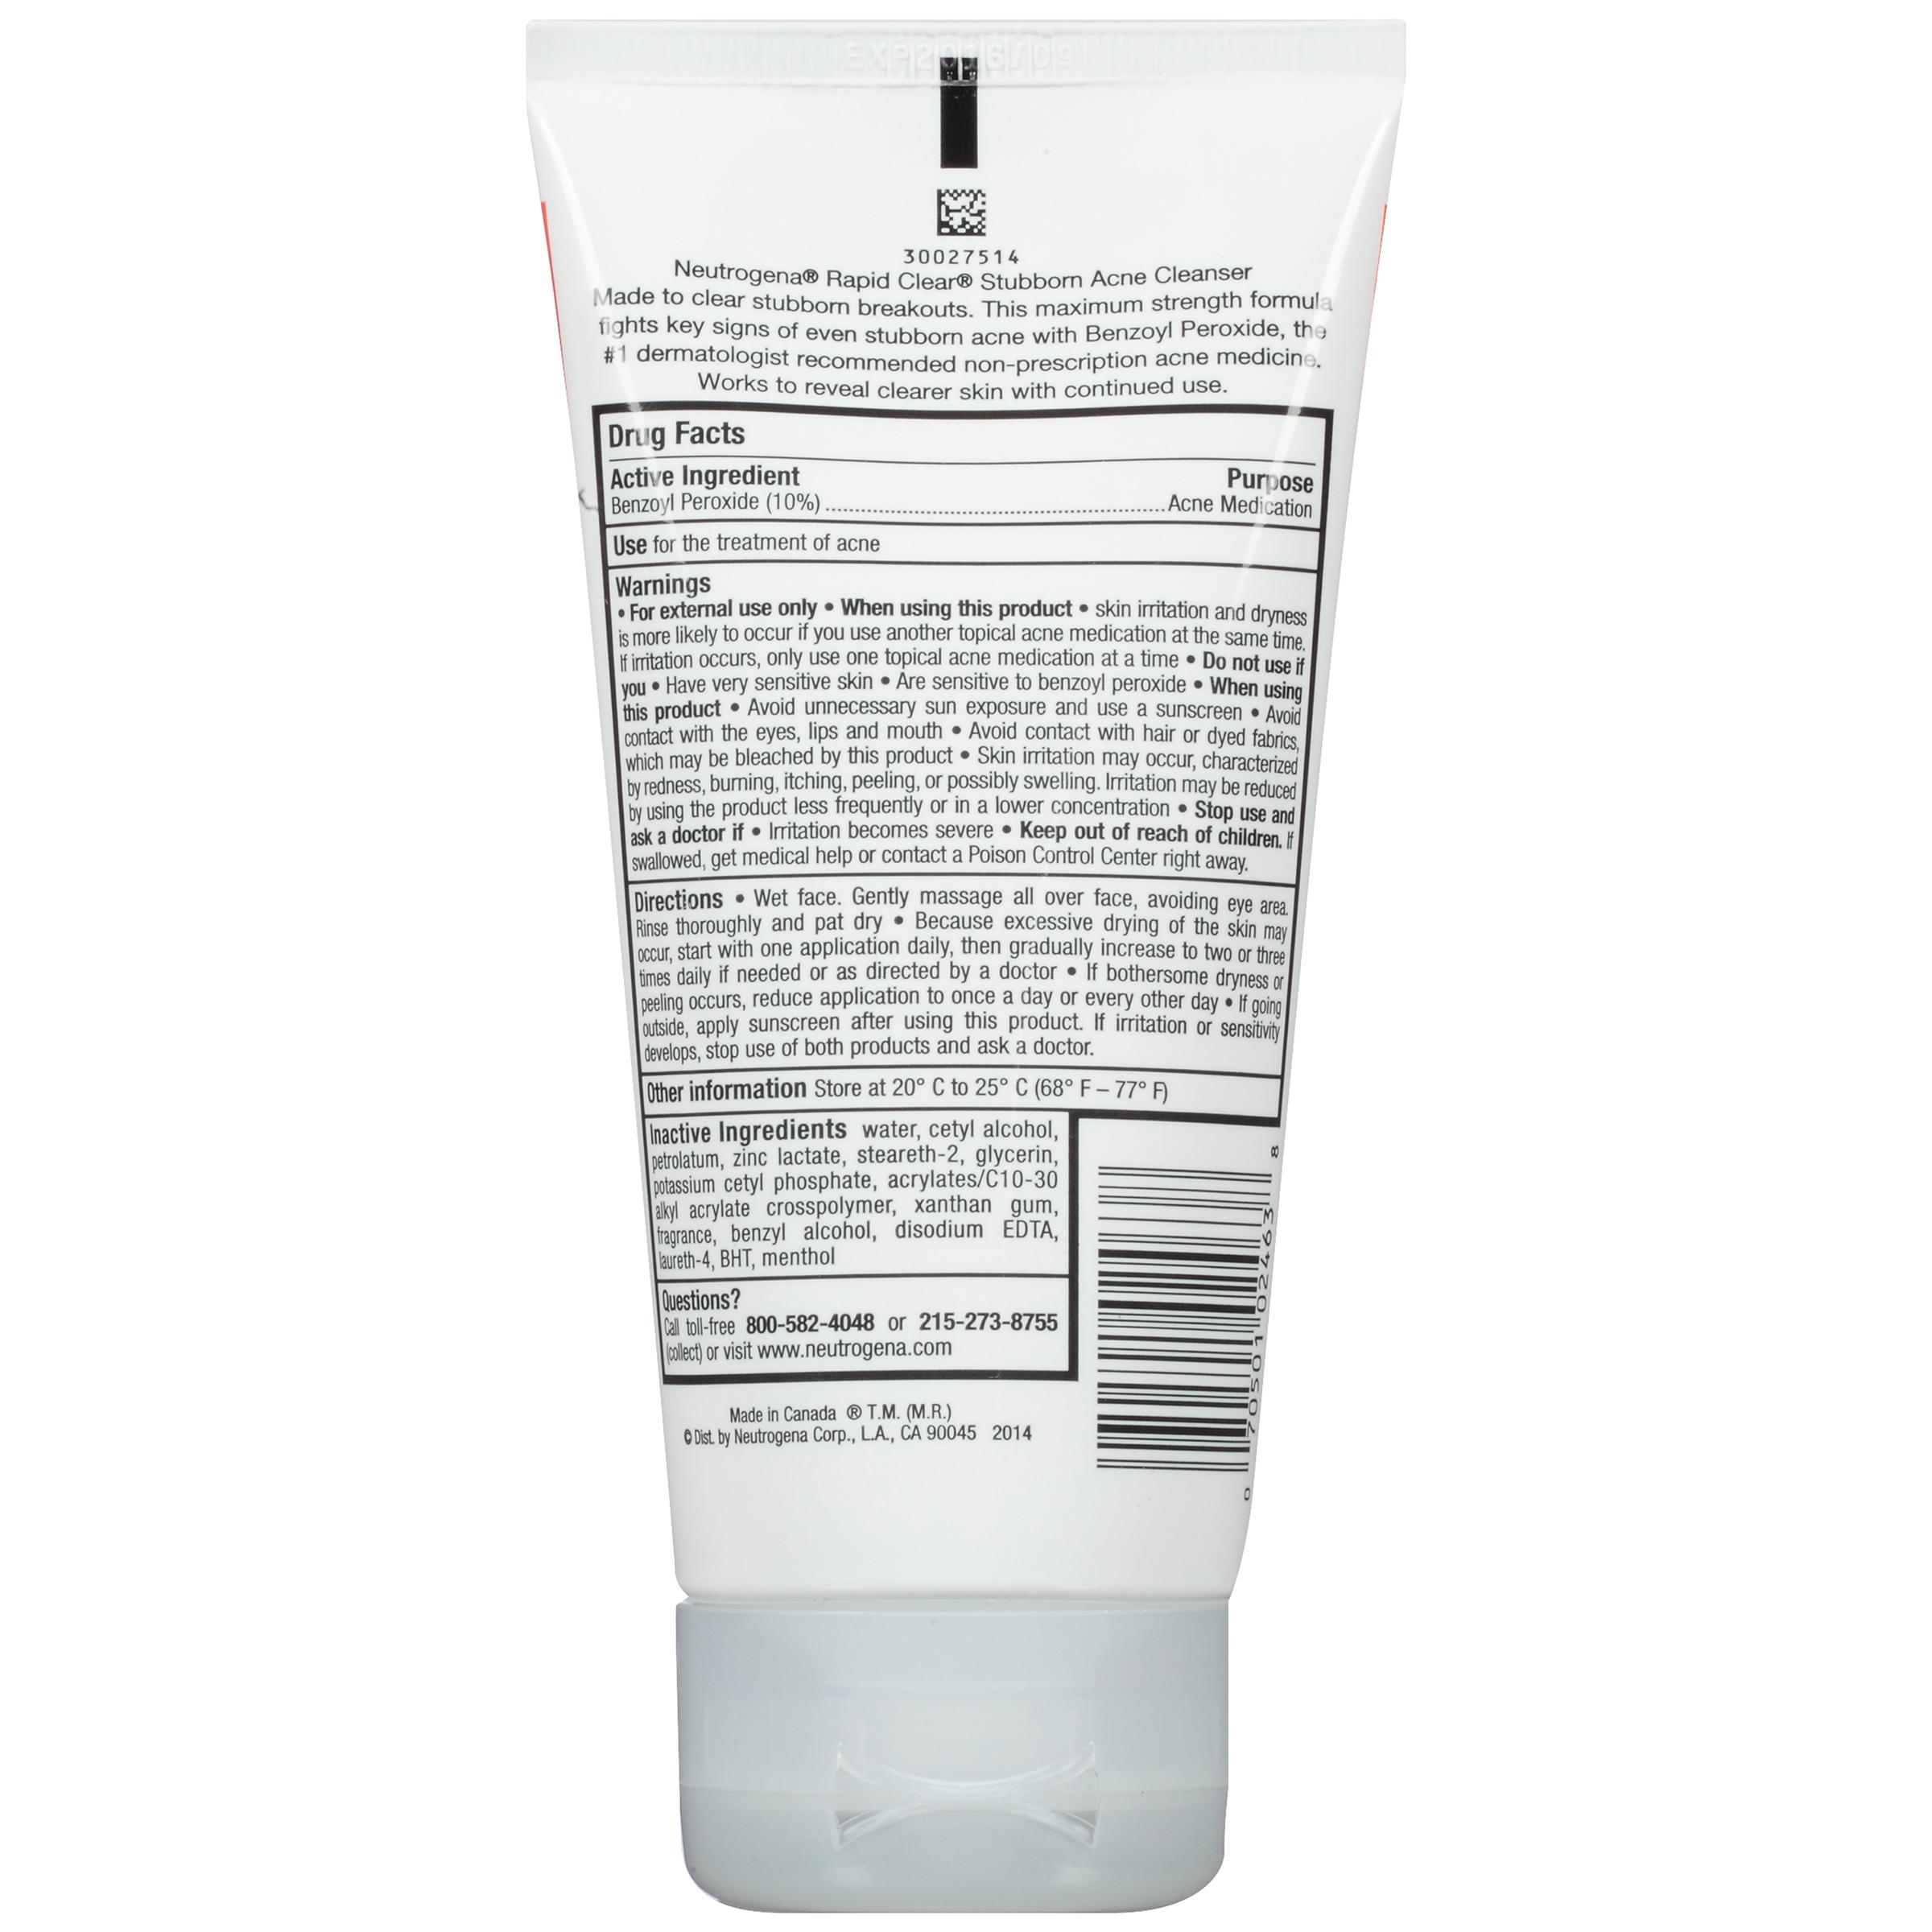 Neutrogena Stubborn Acne Cleanser Rapid Clear® 5 OZ TUBE